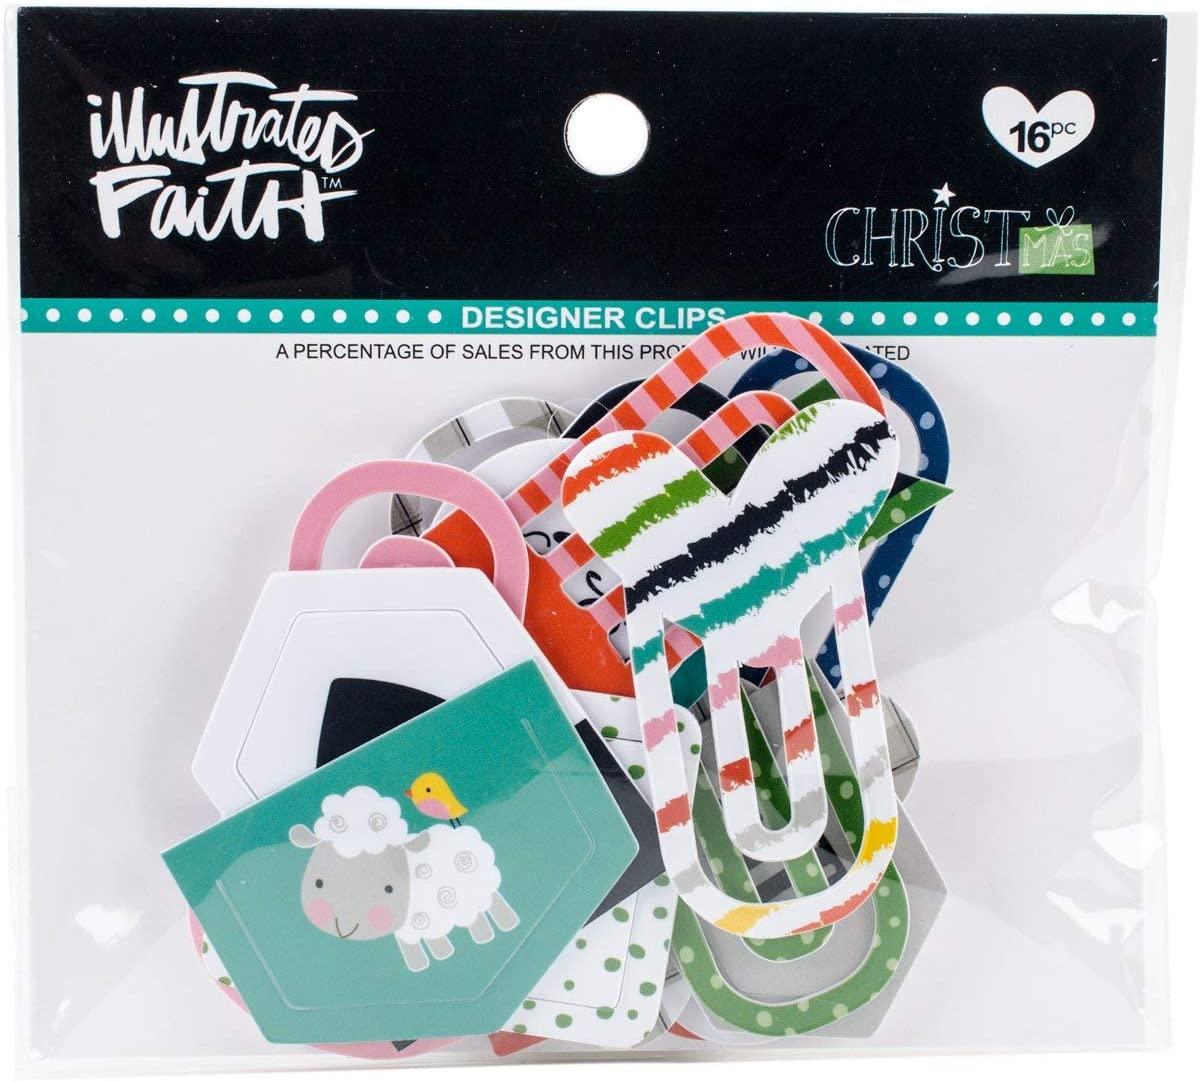 Bella Blvd Illustrated Faith CHRISTmas Designer Clips